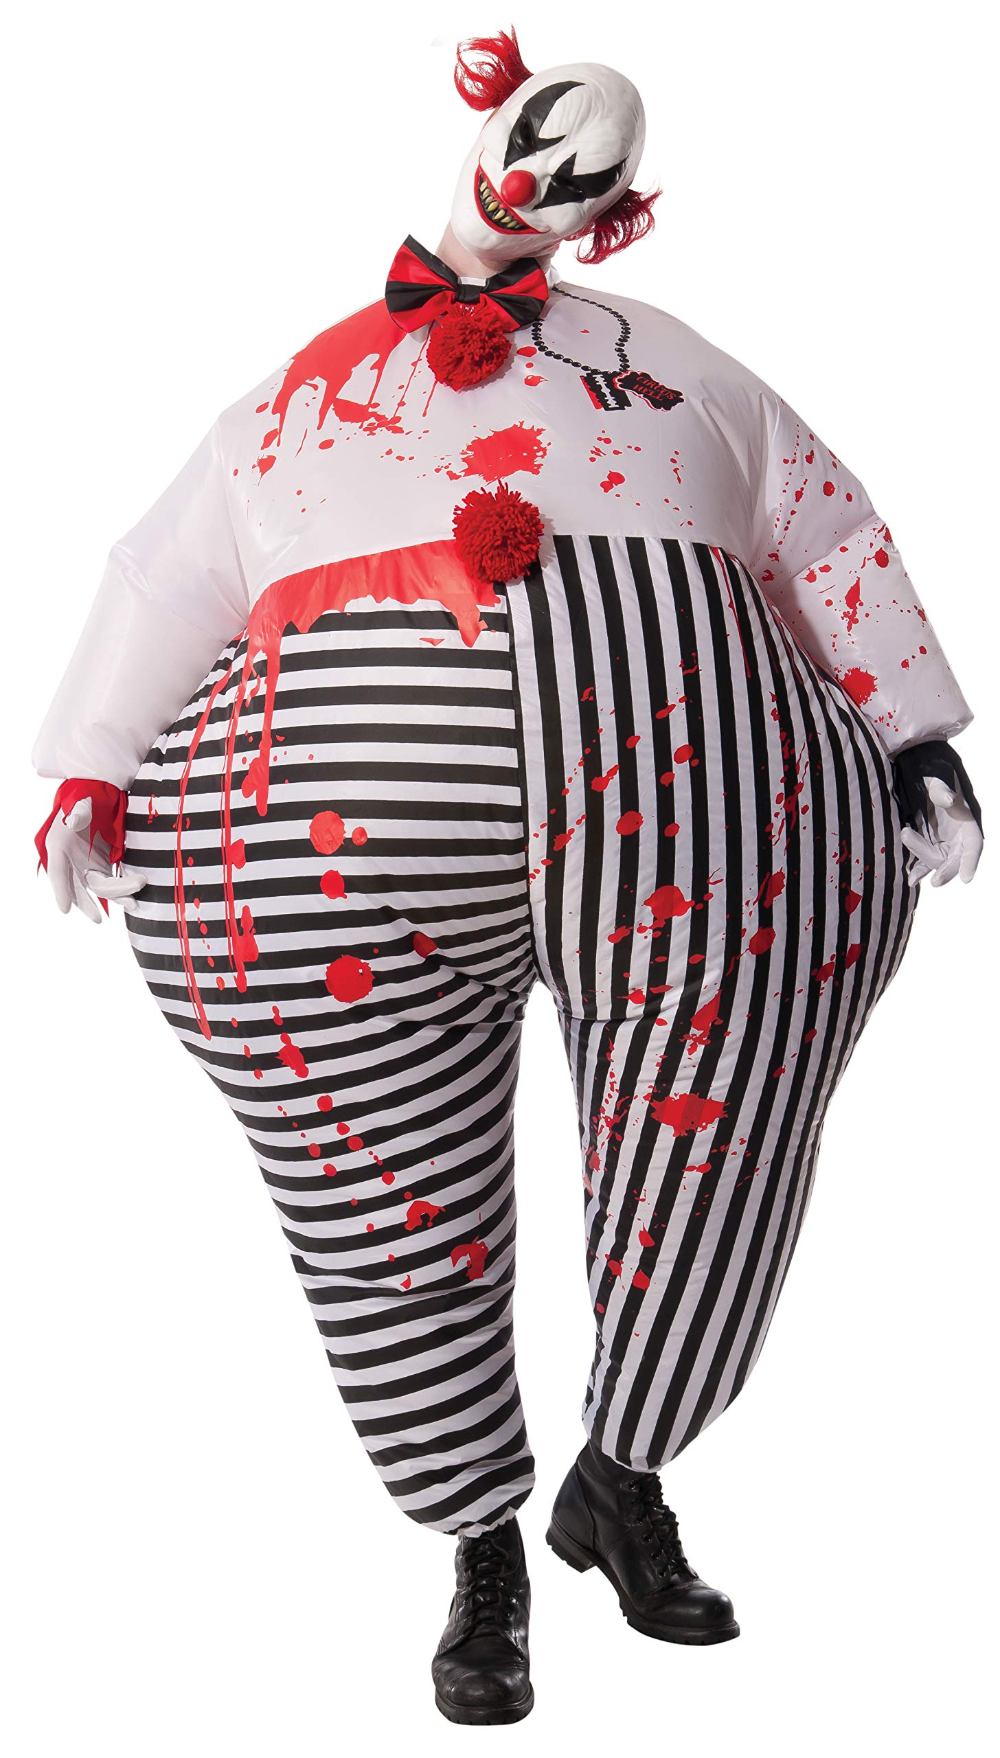 Costume Co Men S Inflatable Evil Clown Costume Shopinzar Com Scary Clown Costume Clown Halloween Costumes Clown Costume